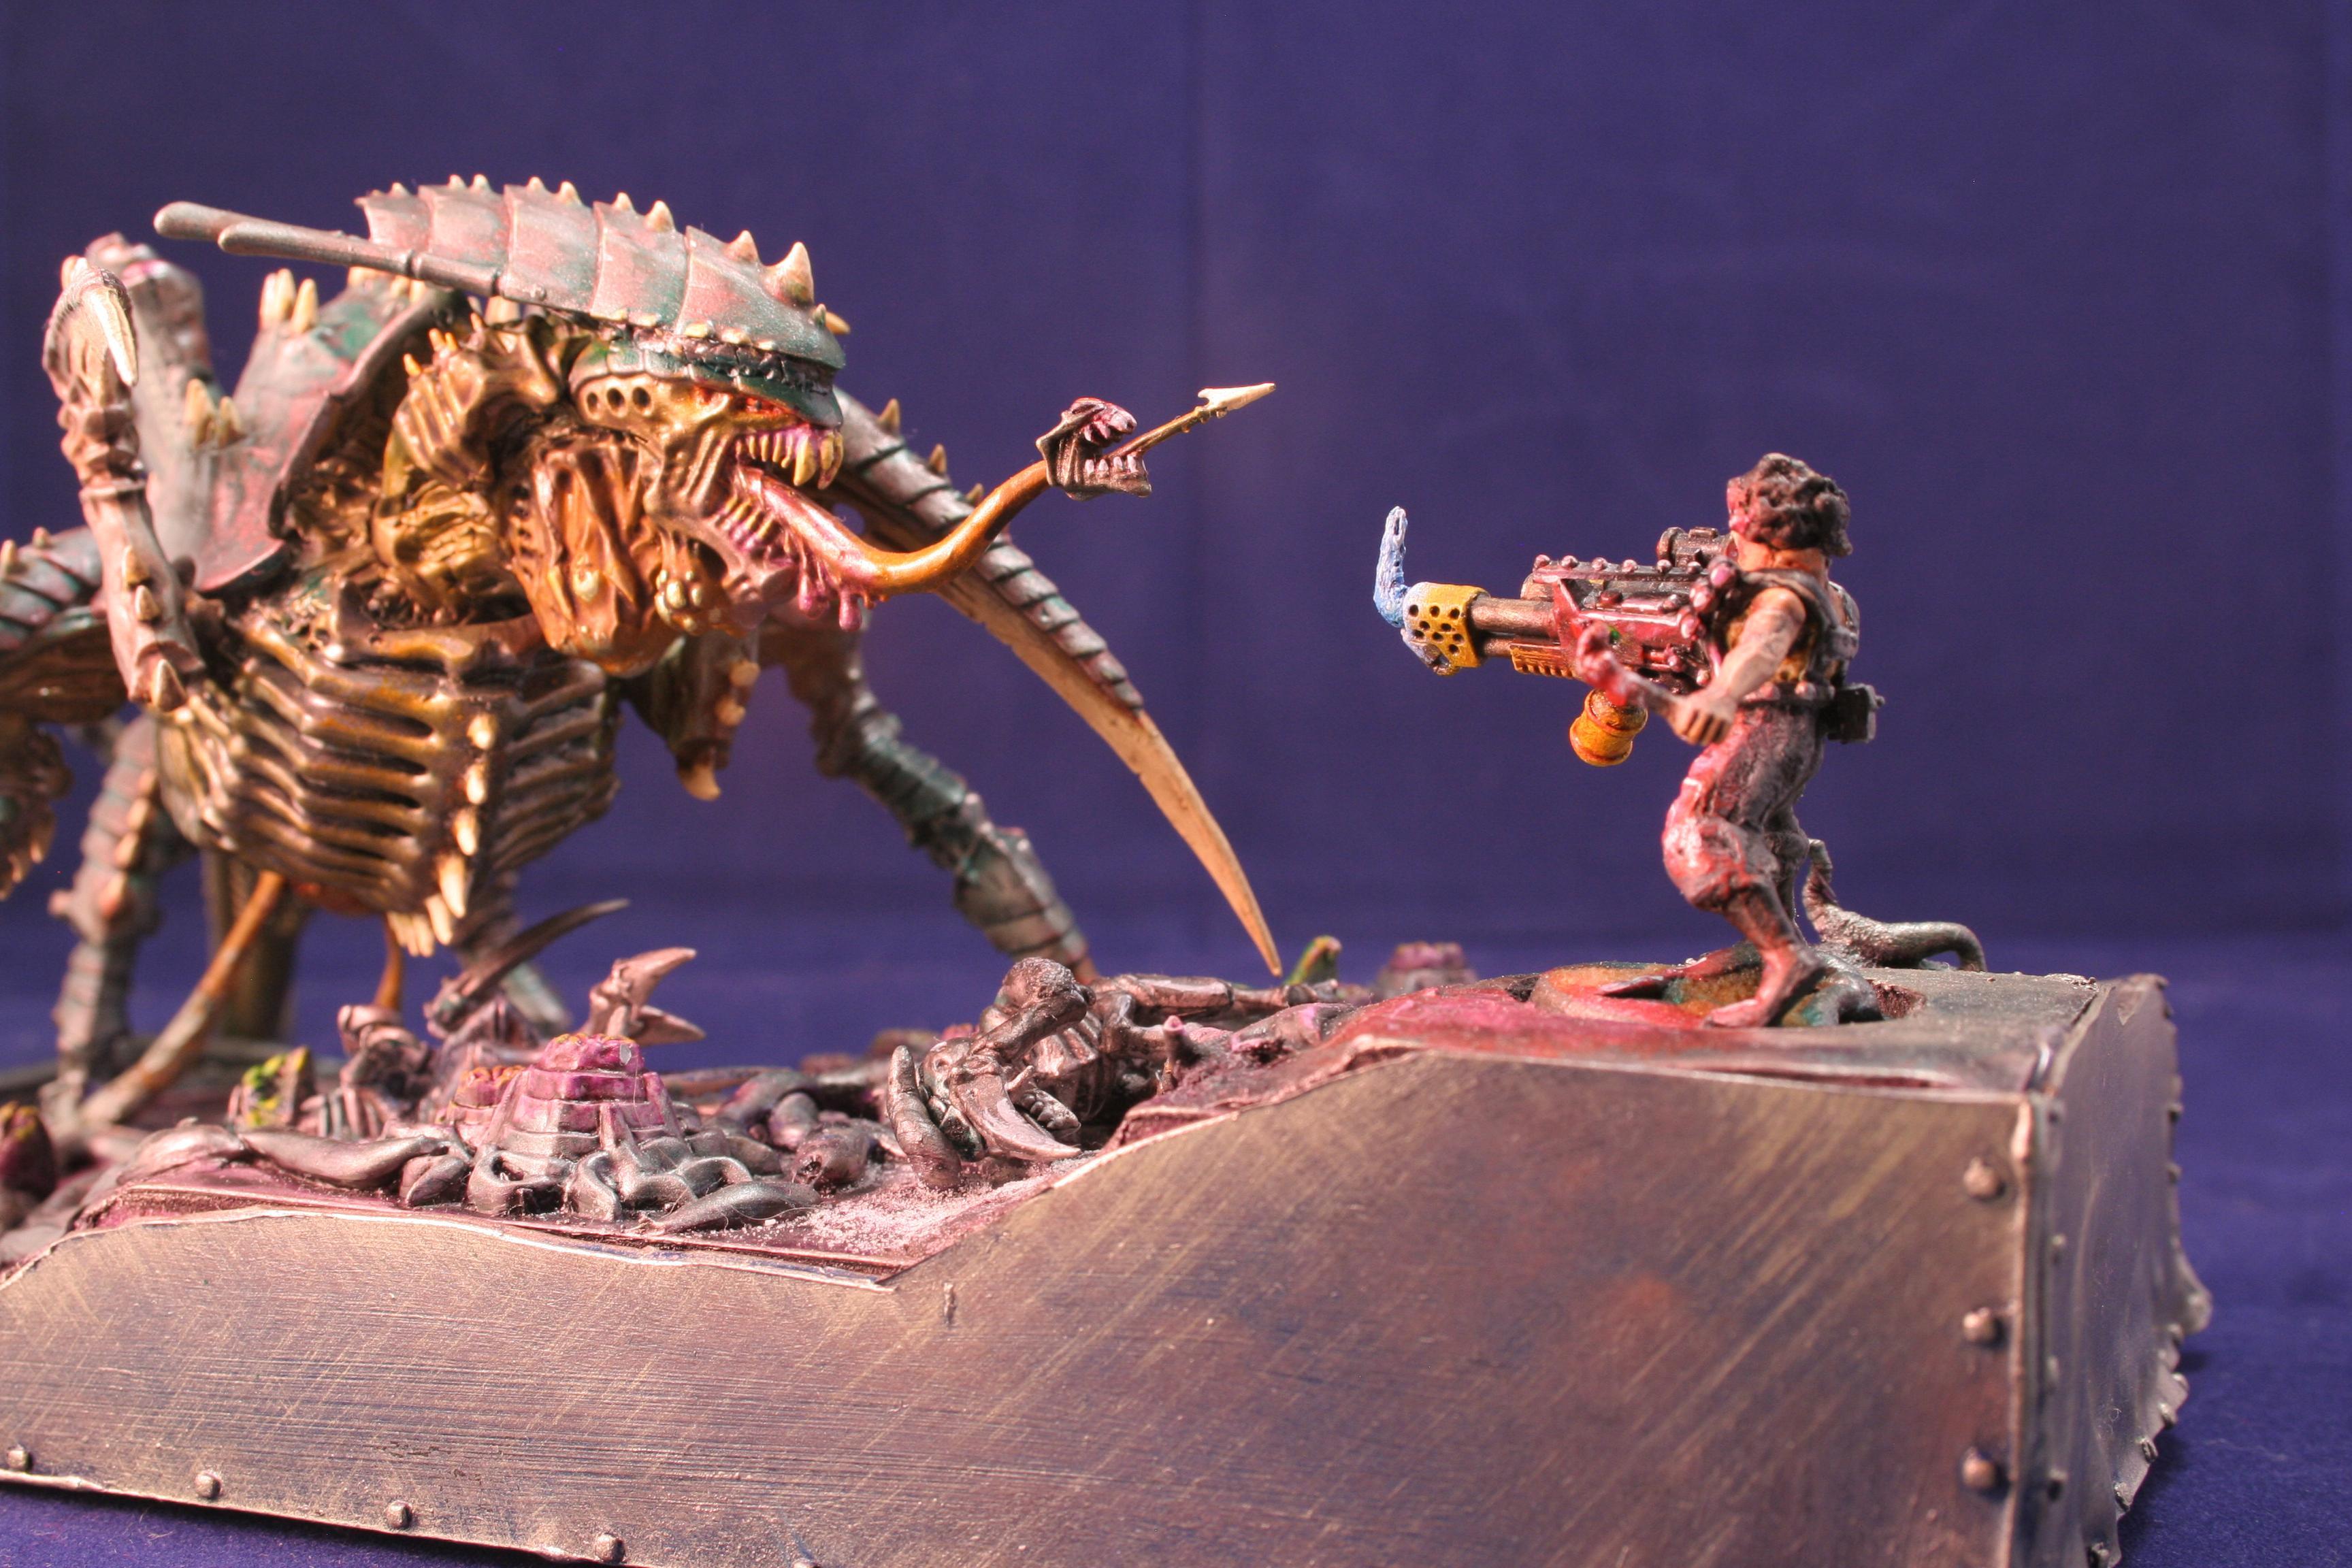 Aliens, Mother, Ripley, Tyranids